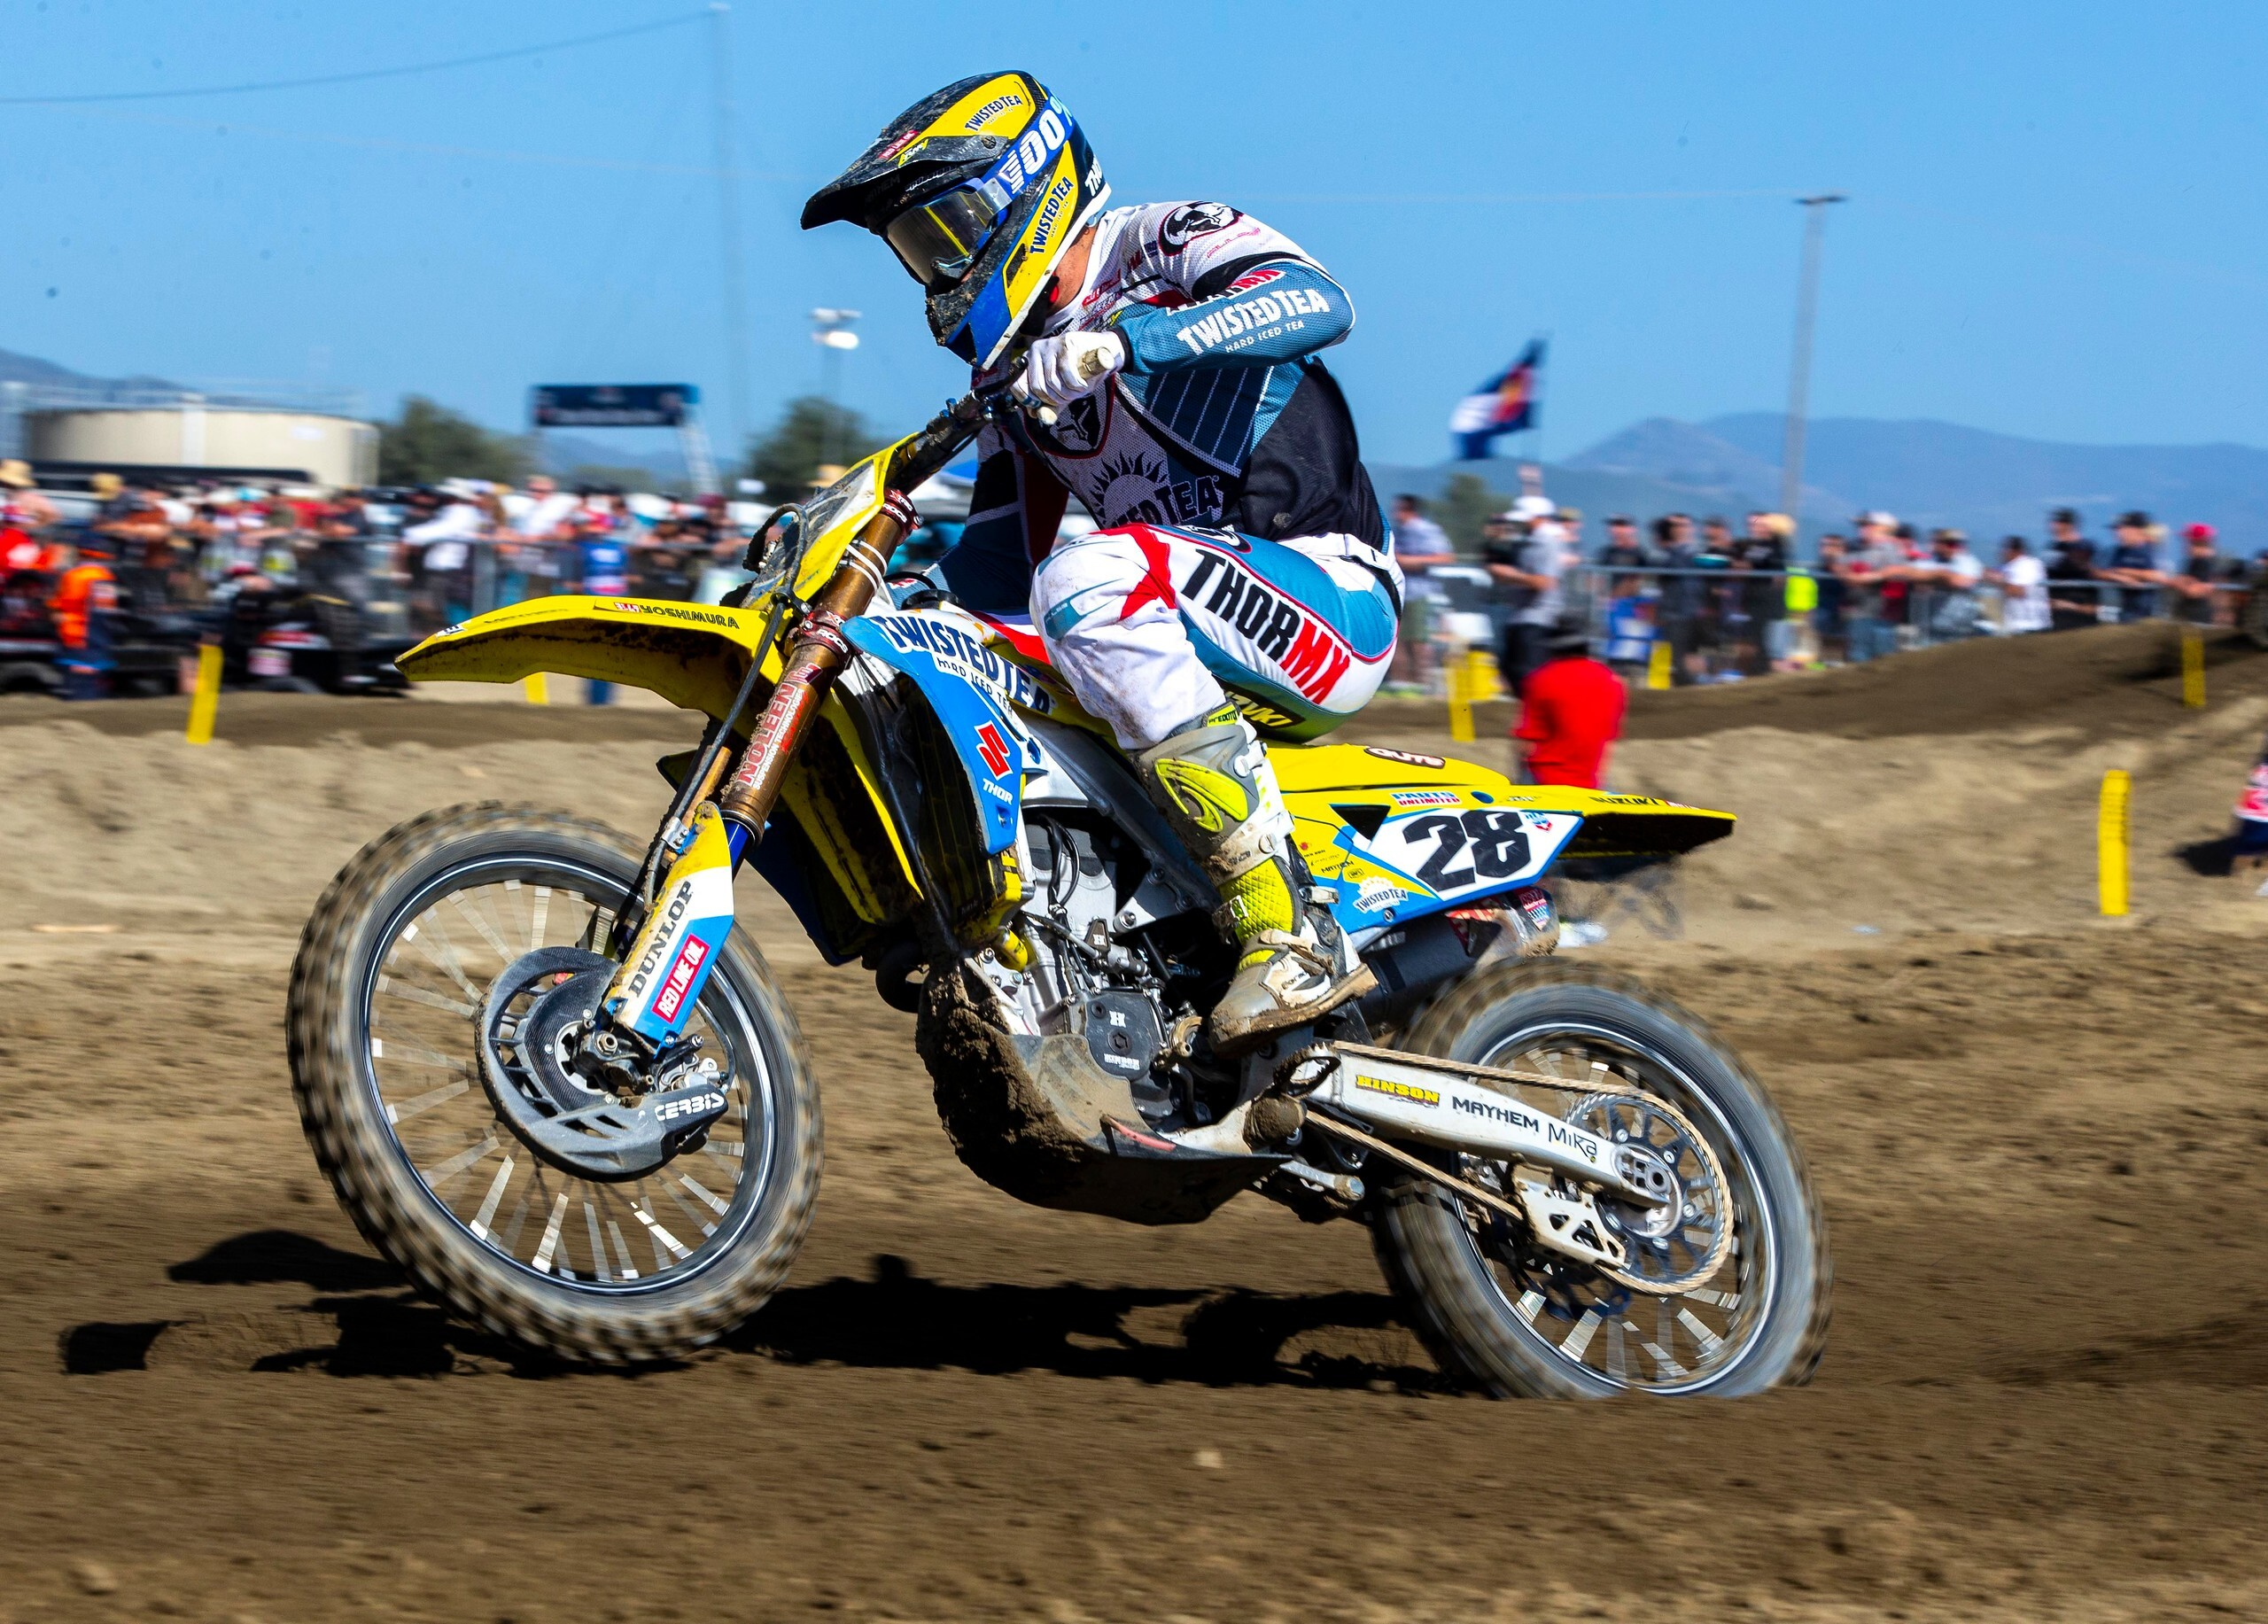 Brandon Hartranft (28) raced hard in the first motocross race of 2021 on his Suzuki RM-Z450